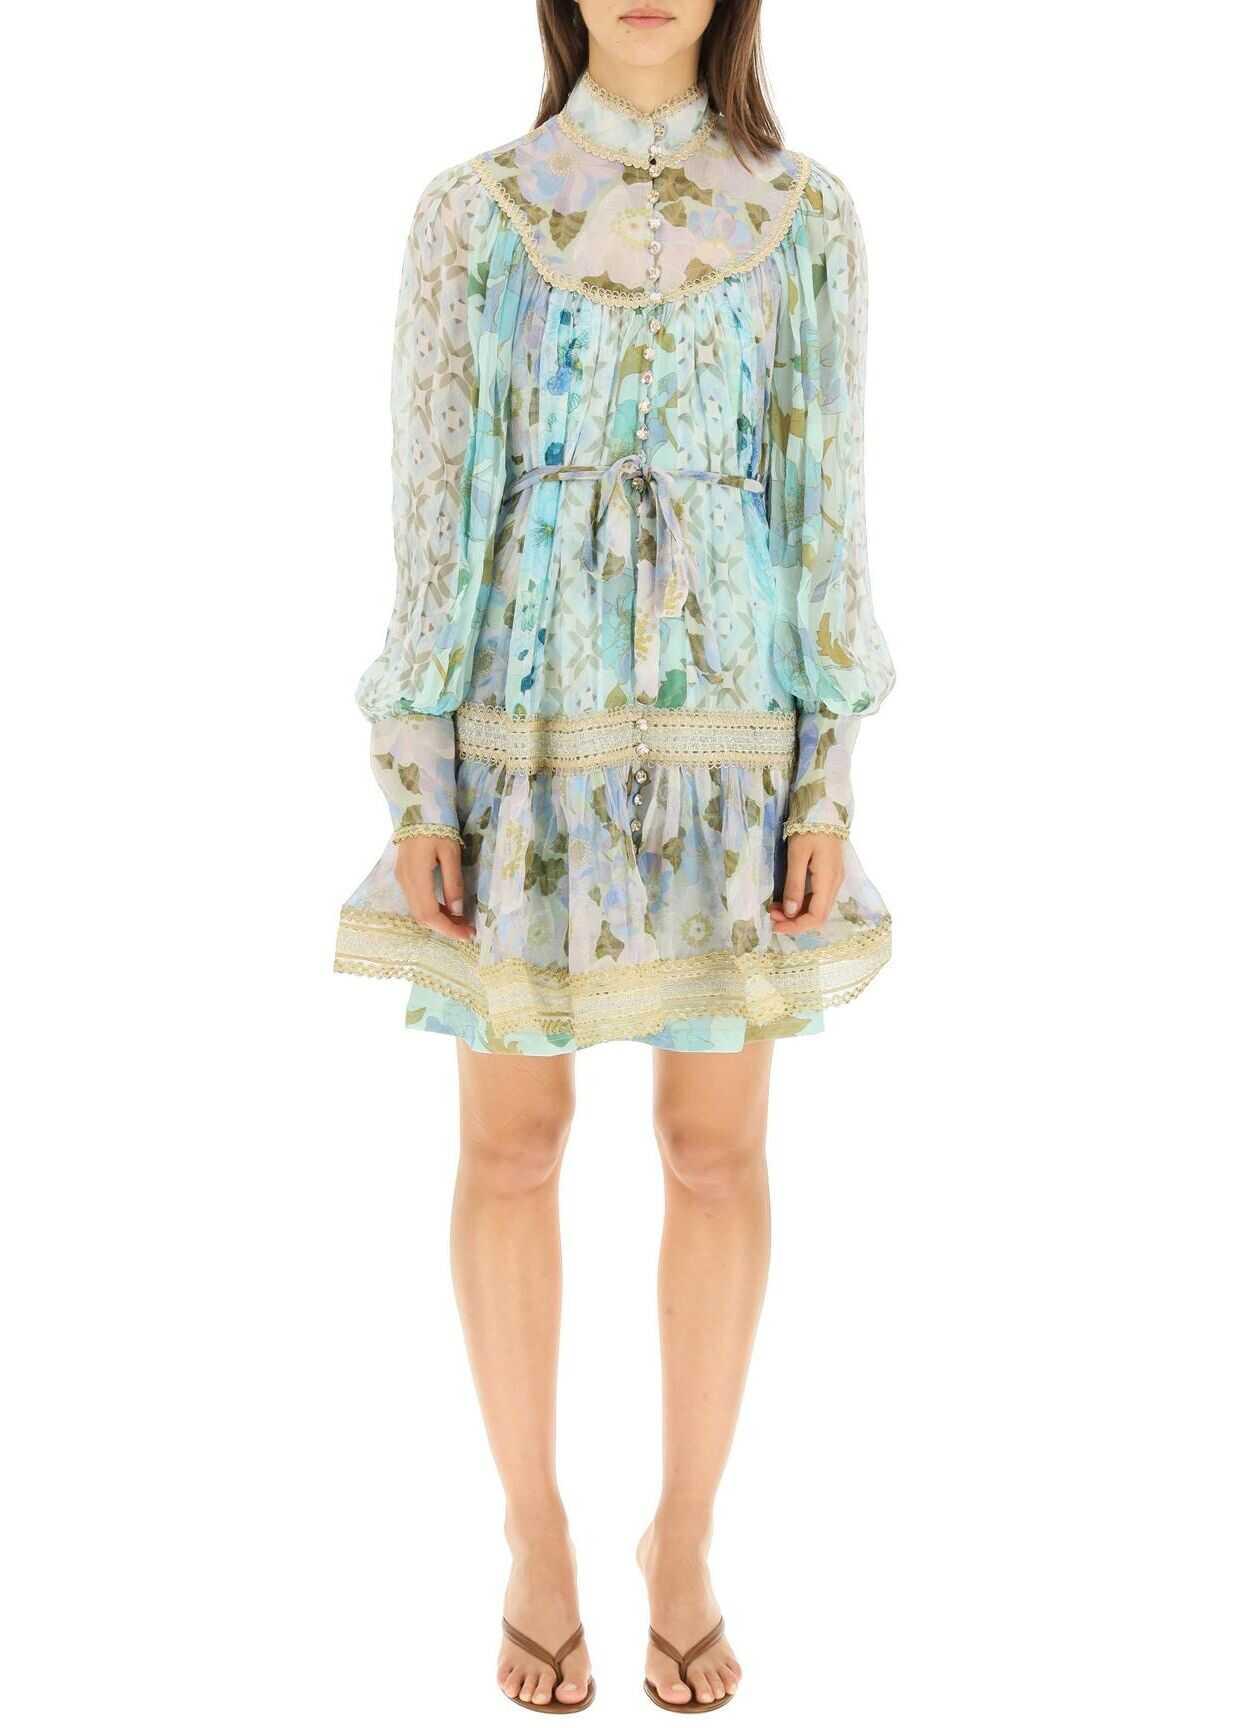 ZIMMERMANN Rhythm Mini Dress With Trimmings 2253DRHY ACQUA MIXED PRINT image0